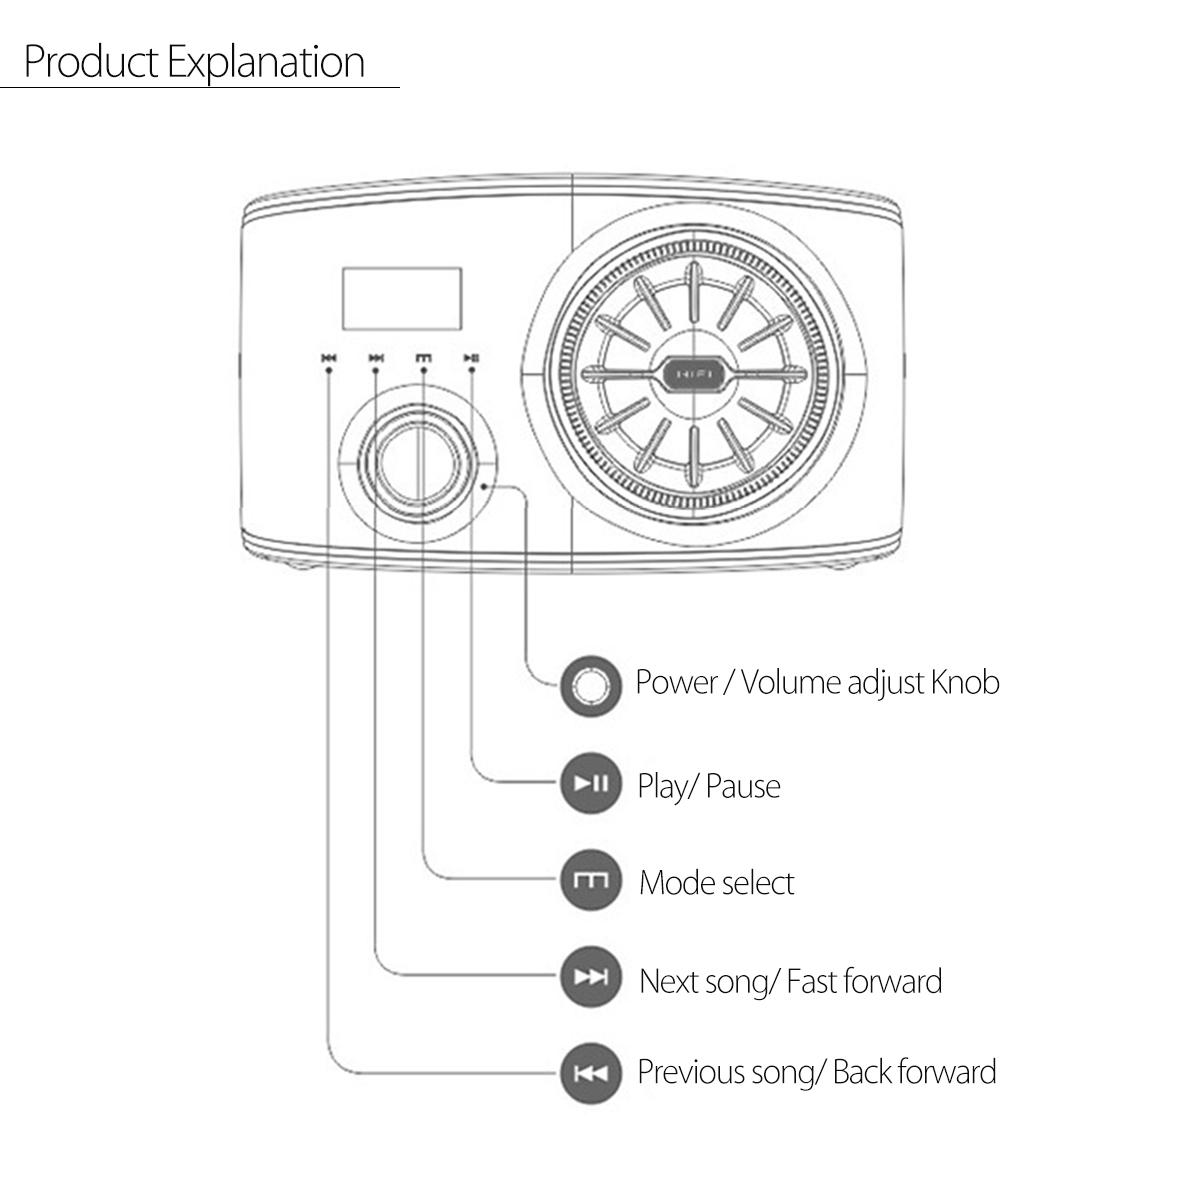 motor 1994 general motors wiring diagram manualincludes ac heater vacuum circuitsprofessional service trade edition motor domestic wiring diagram manual